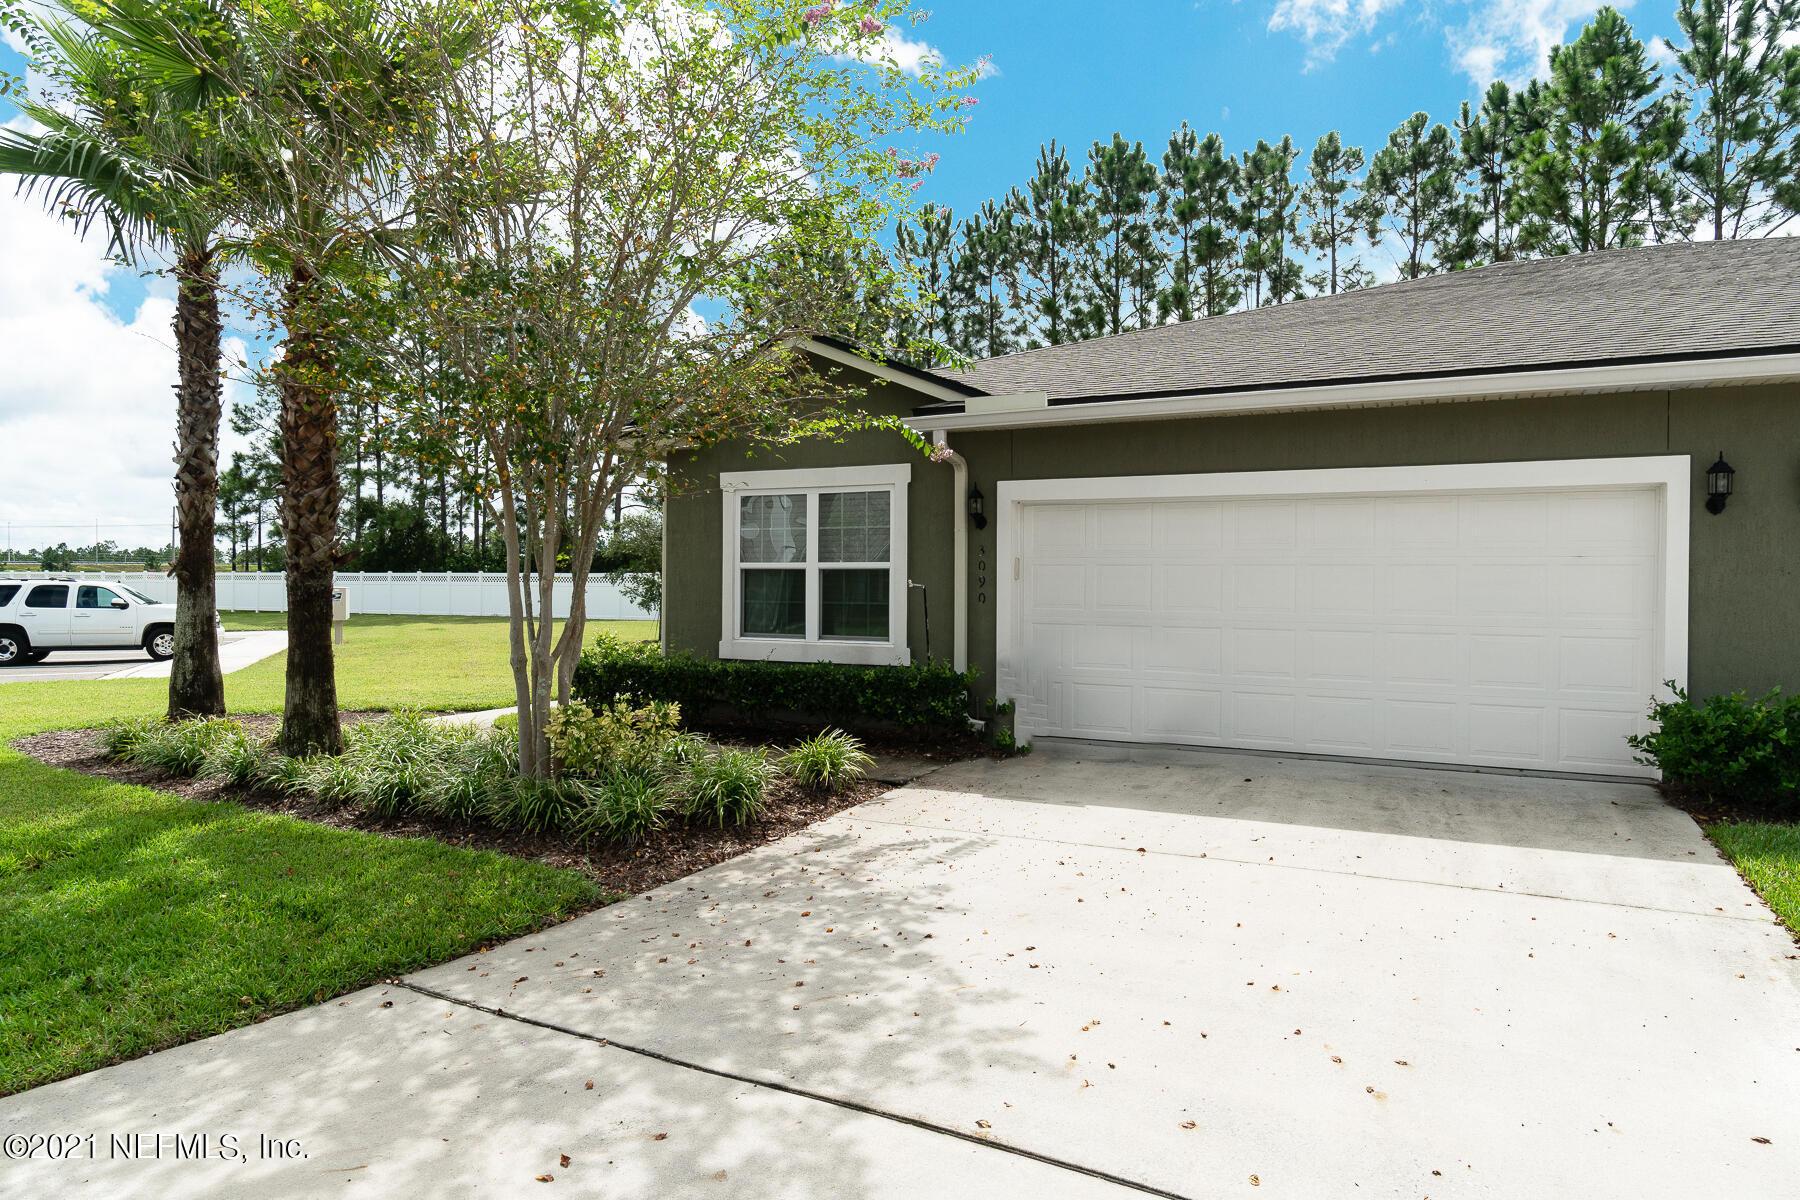 3090 CHESTNUT RIDGE, ORANGE PARK, FLORIDA 32065, 2 Bedrooms Bedrooms, ,2 BathroomsBathrooms,Residential,For sale,CHESTNUT RIDGE,1132528